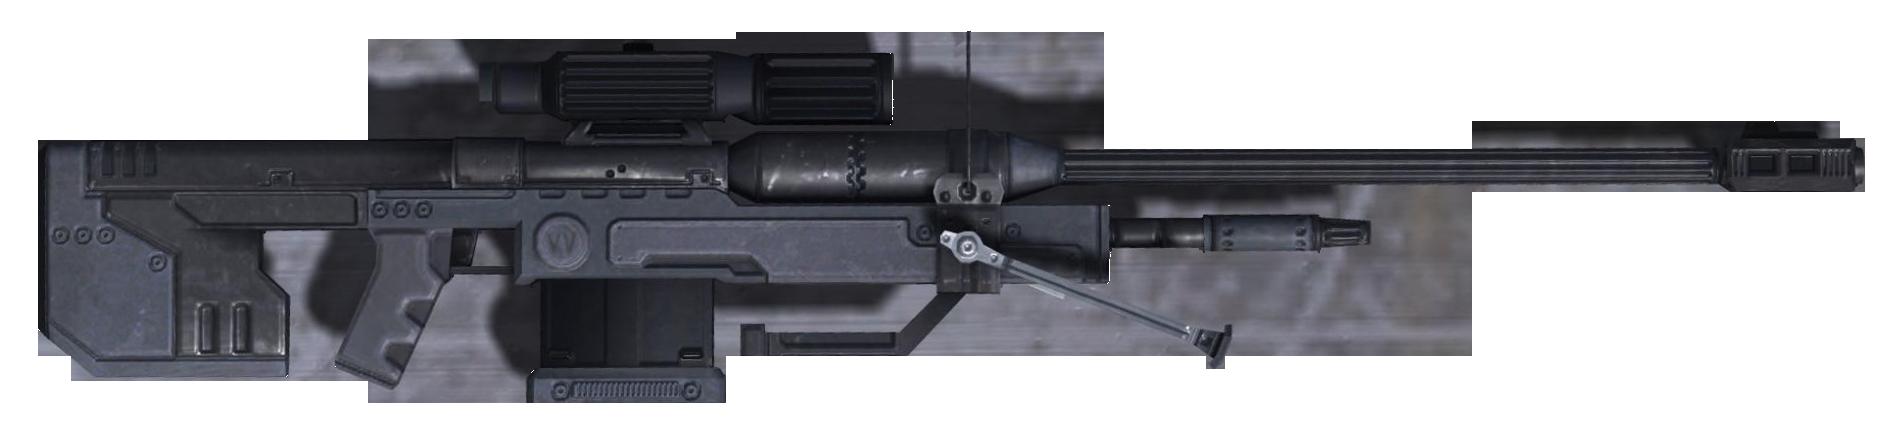 clip art library download Transparent sniper. Image srs d s.